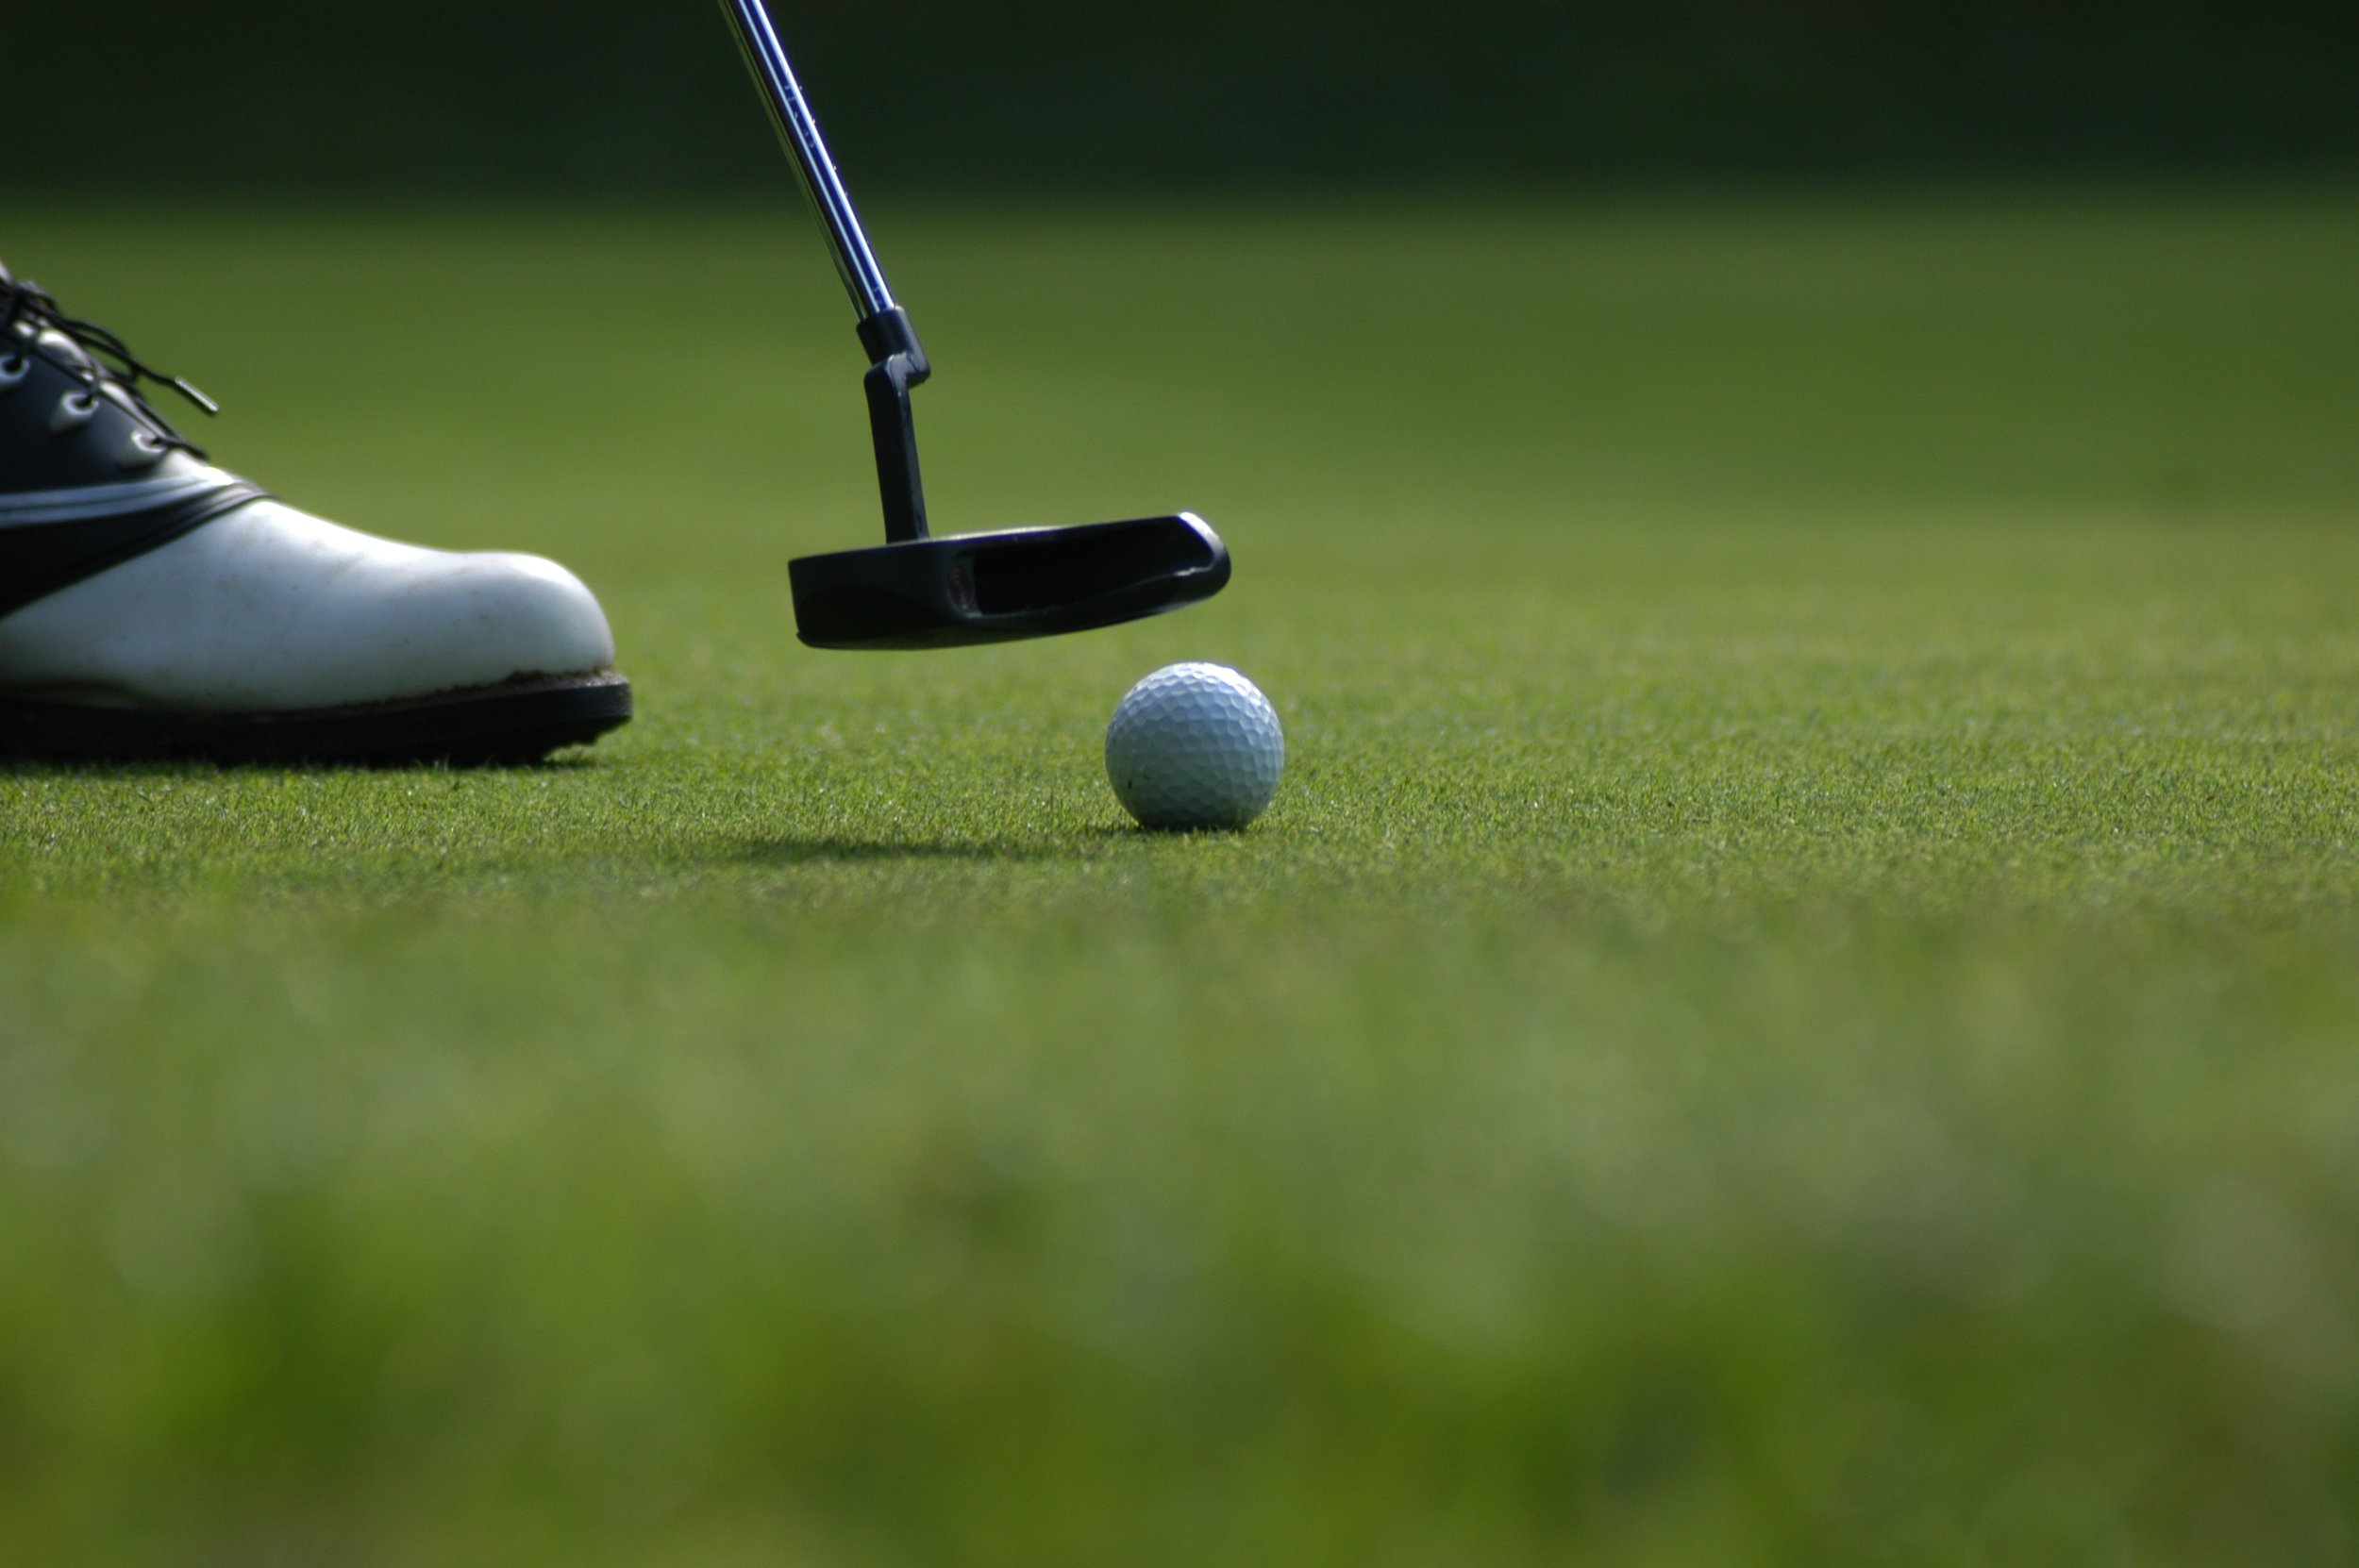 wanderlust-travel-blog-bachelor-party-travel-golf